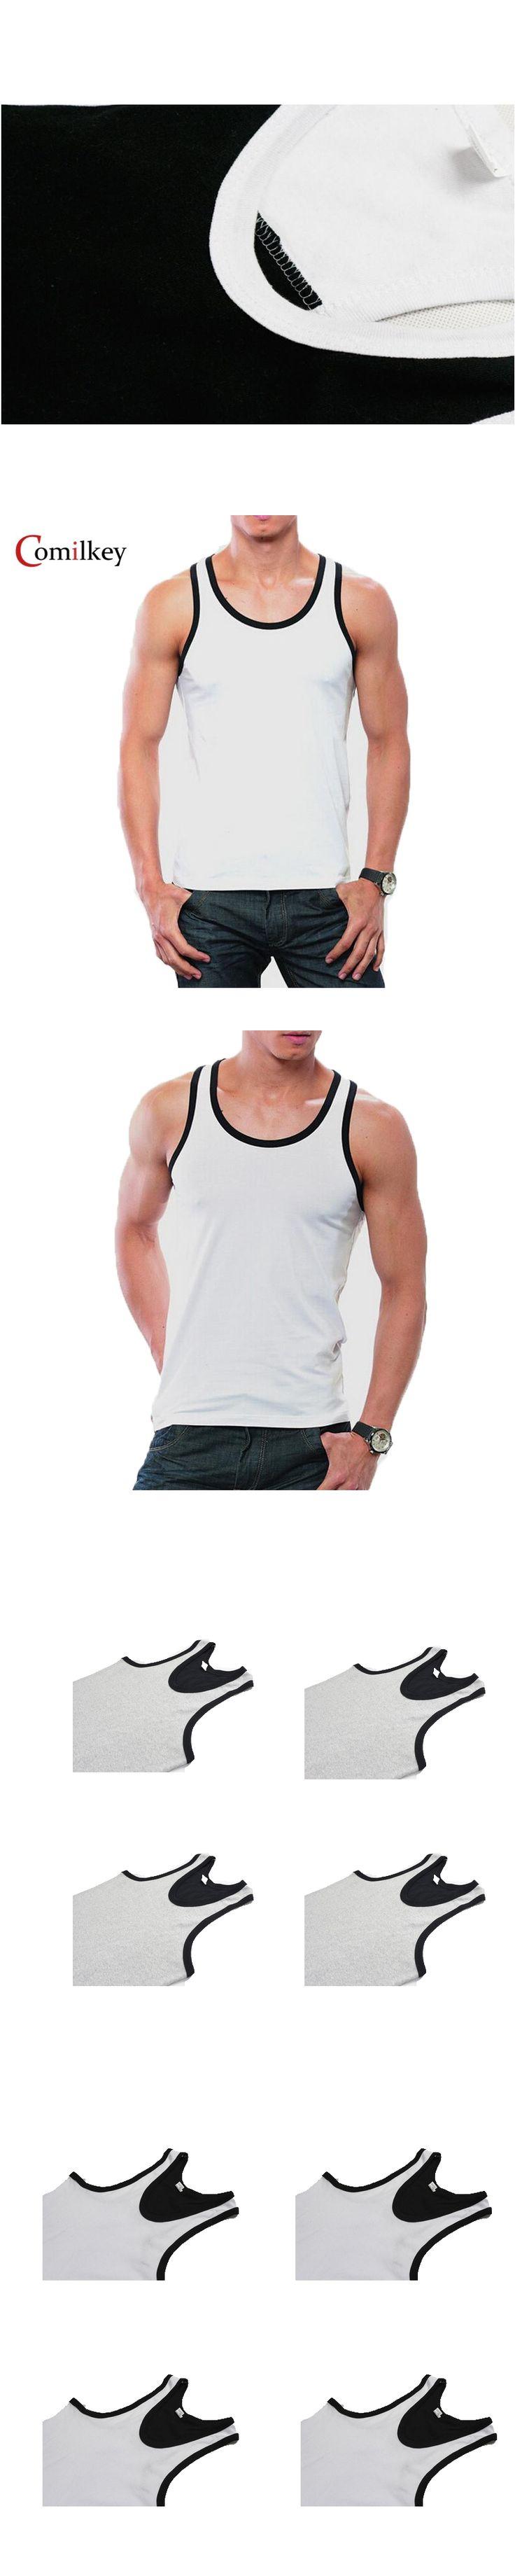 2017 Clothing Casual Gilet Men O-Neck Tank Tops Summer Male Bodybuilding Sleeveless Vest Gymclothing fitness Men T shirt